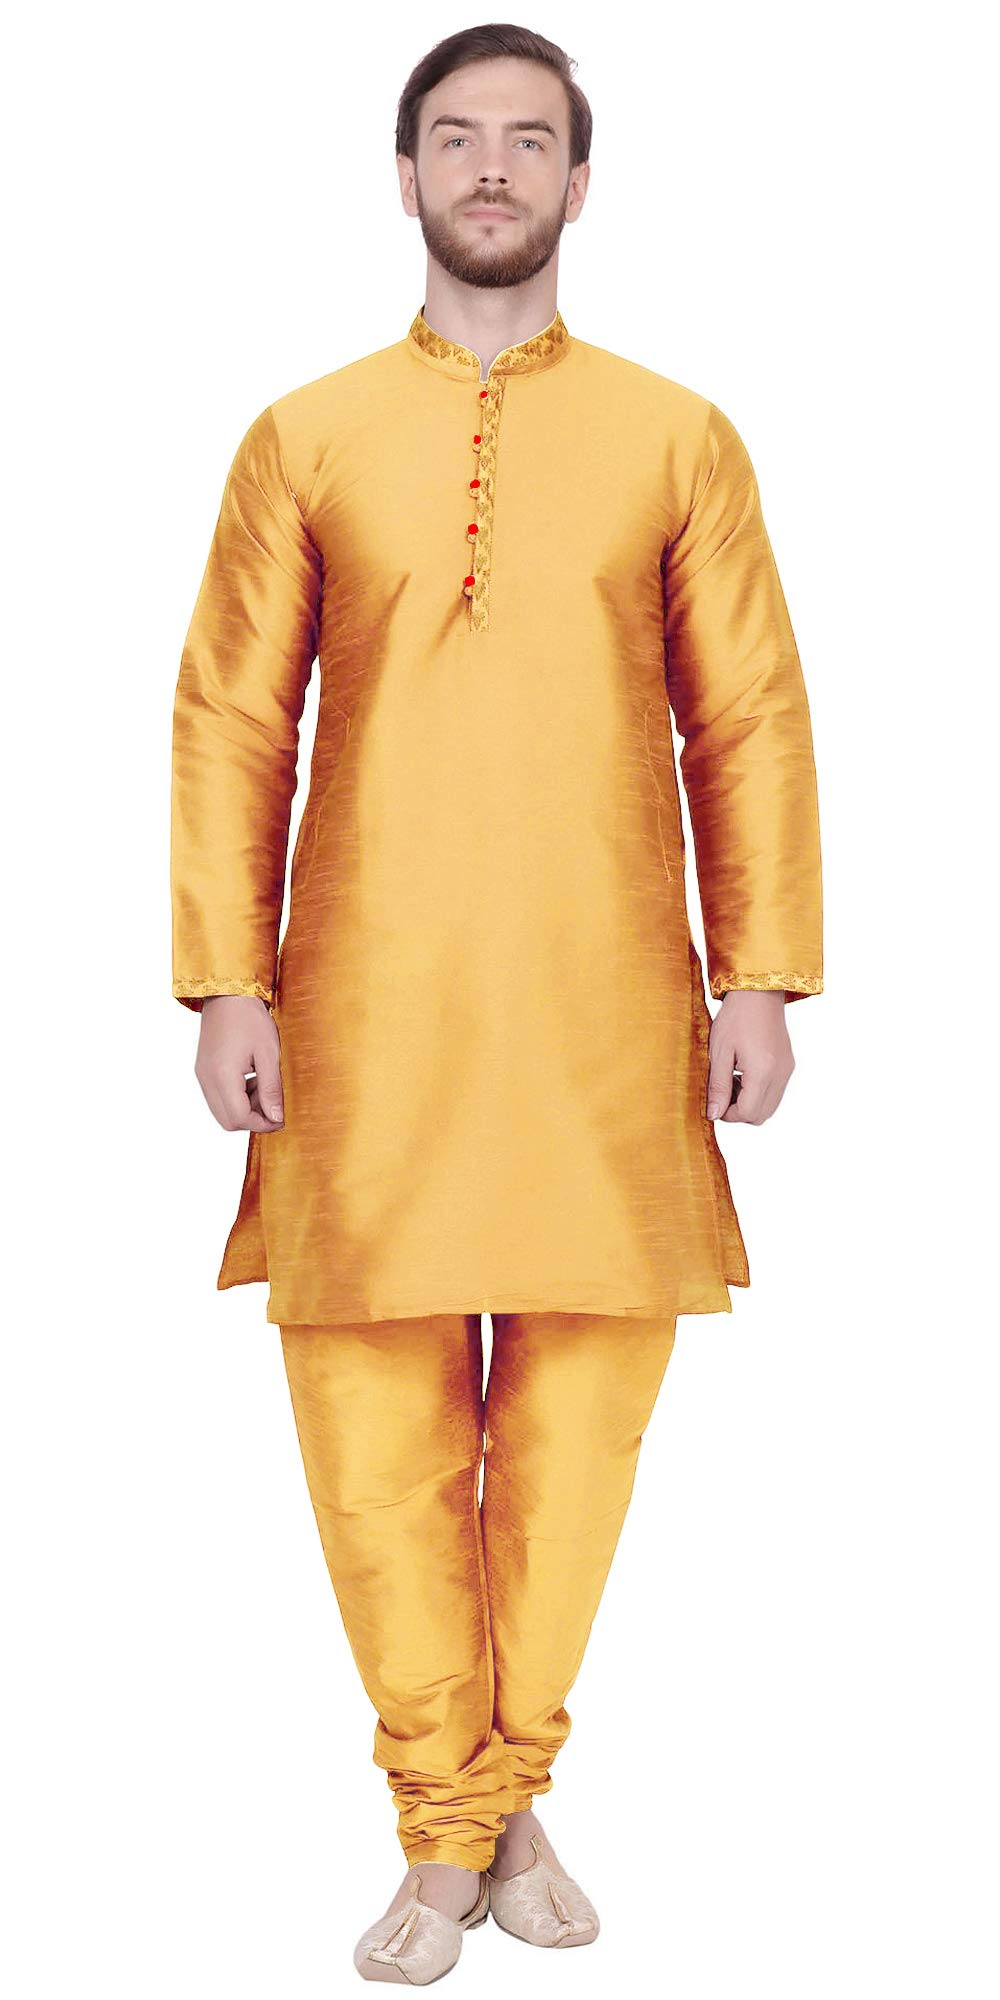 Lakkar Haveli Mens Indian 100/% Cotton Shirt Button Down Tunic Shirts Kurta Solid Gold Color Plus Size